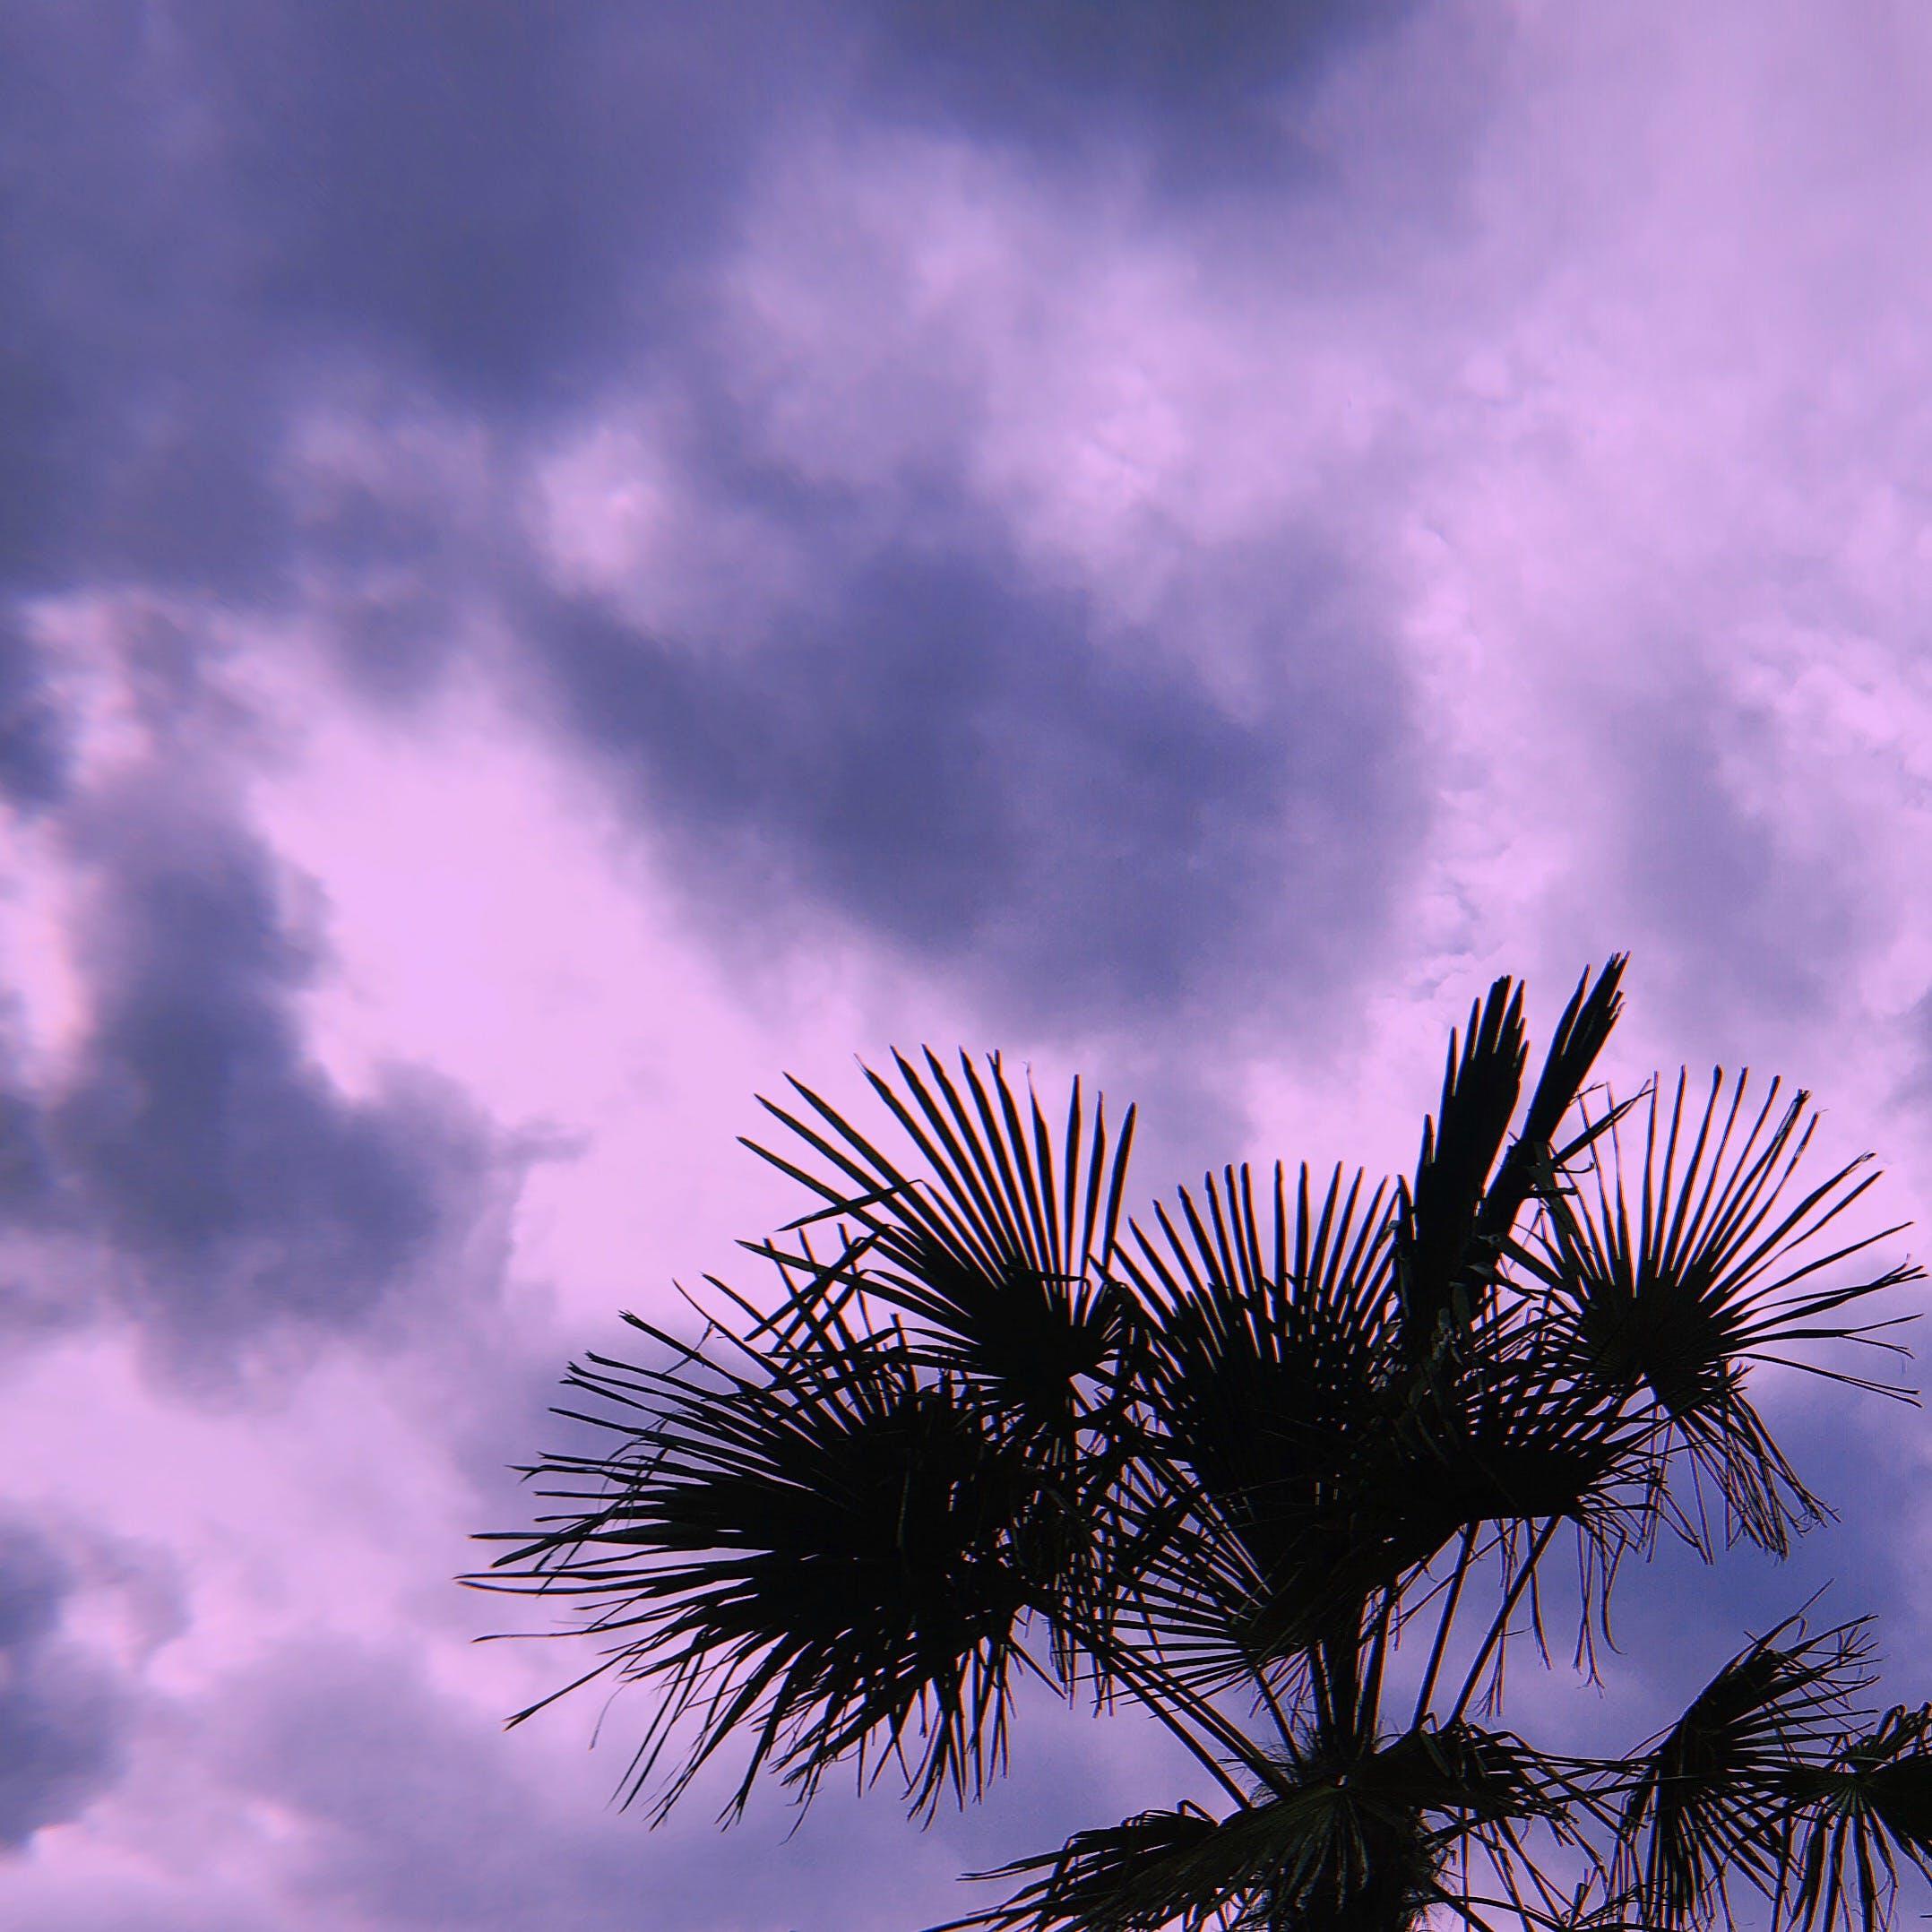 Free stock photo of color, dramatic sky, minimal, palm tree